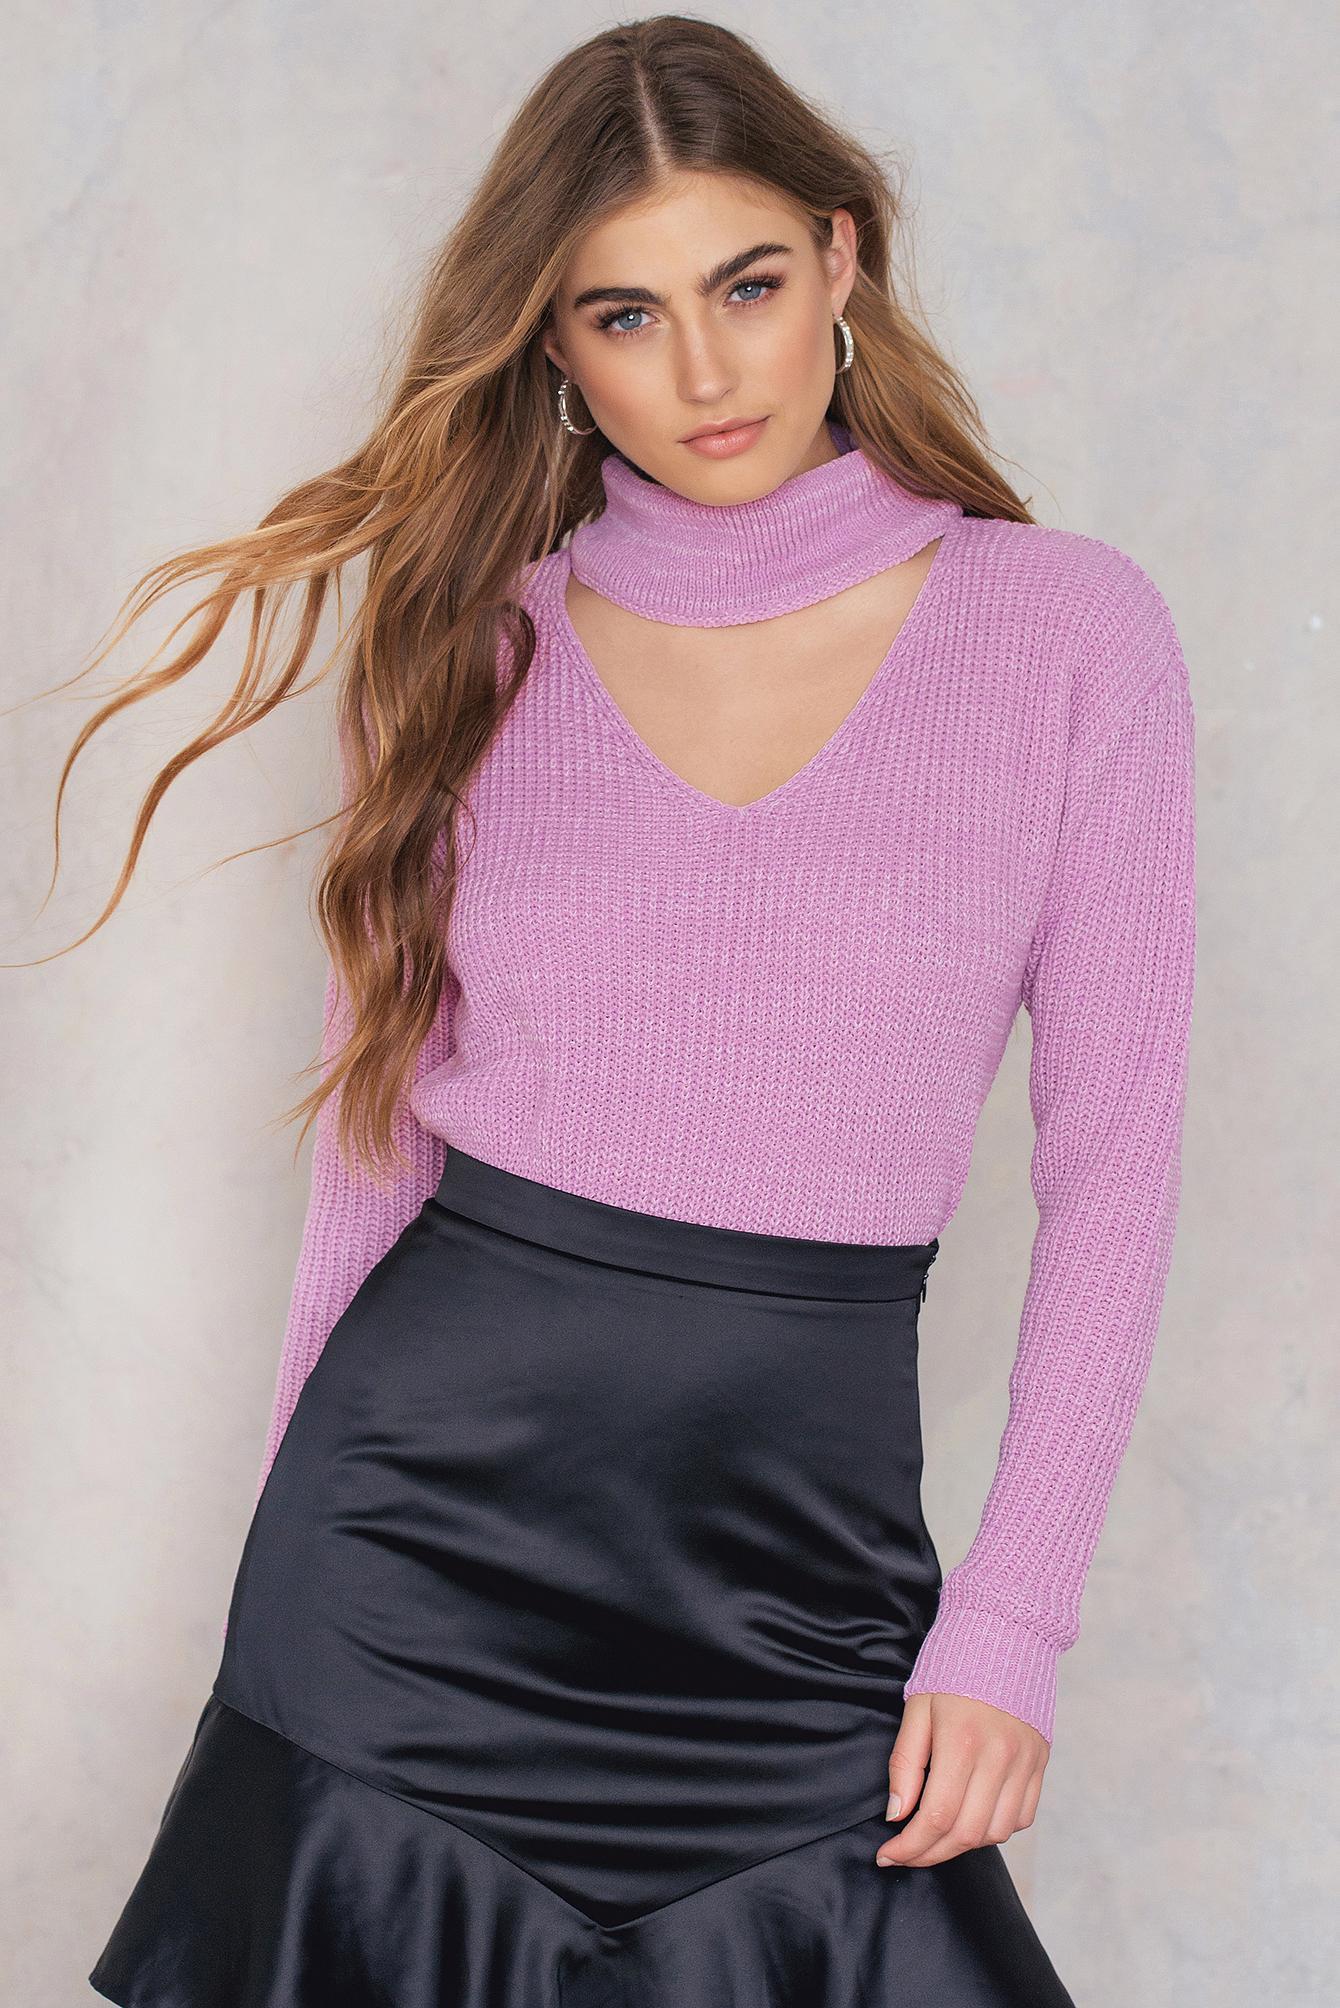 Lyst - Glamorous Choker Neck Jumper in Purple - photo#9